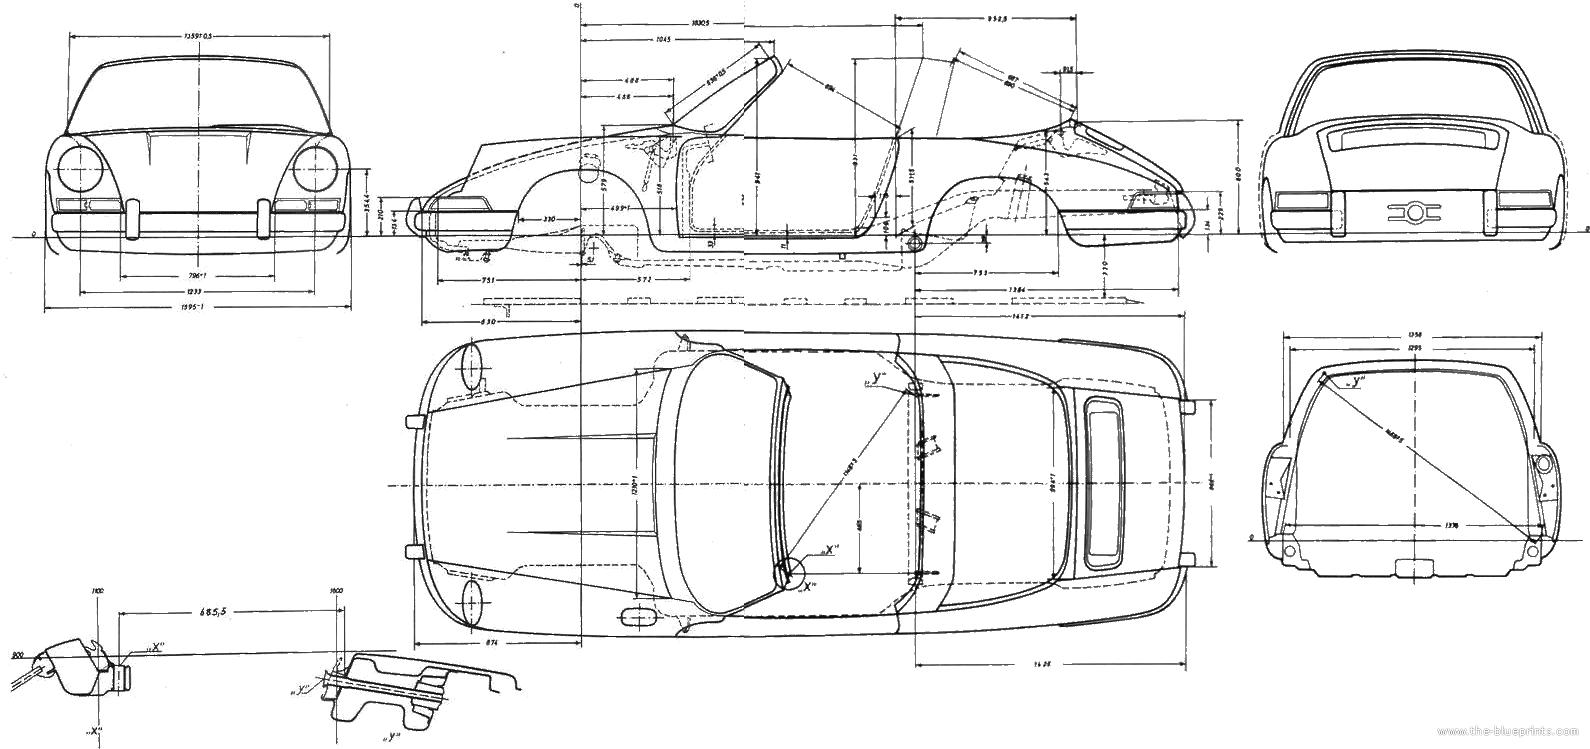 porsche 911 targa technical drawings race cars drag race cars architectural drawings [ 1590 x 749 Pixel ]